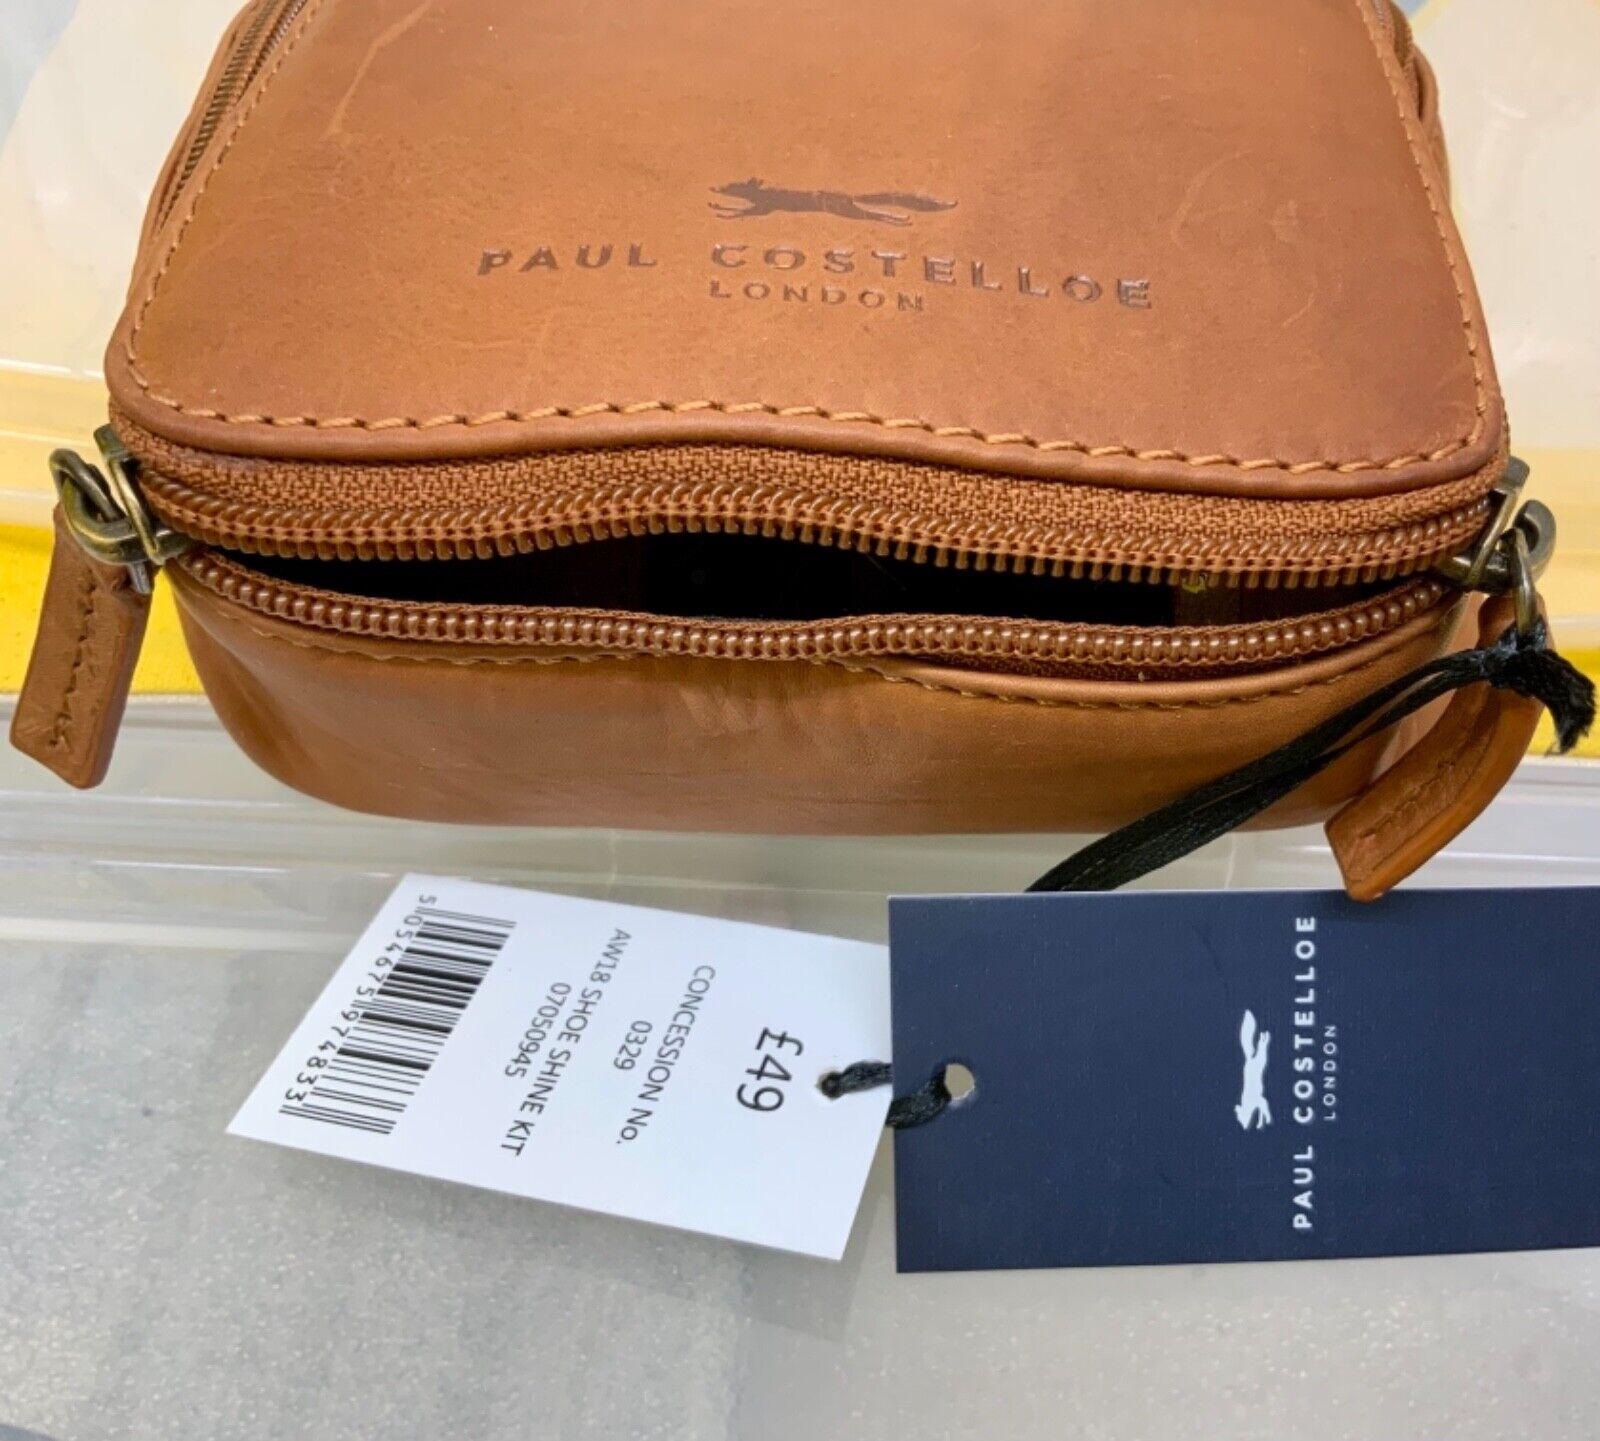 Paul Costelloe leather bag. Shoe cleaning kit travel set. Smart gift set BNWT